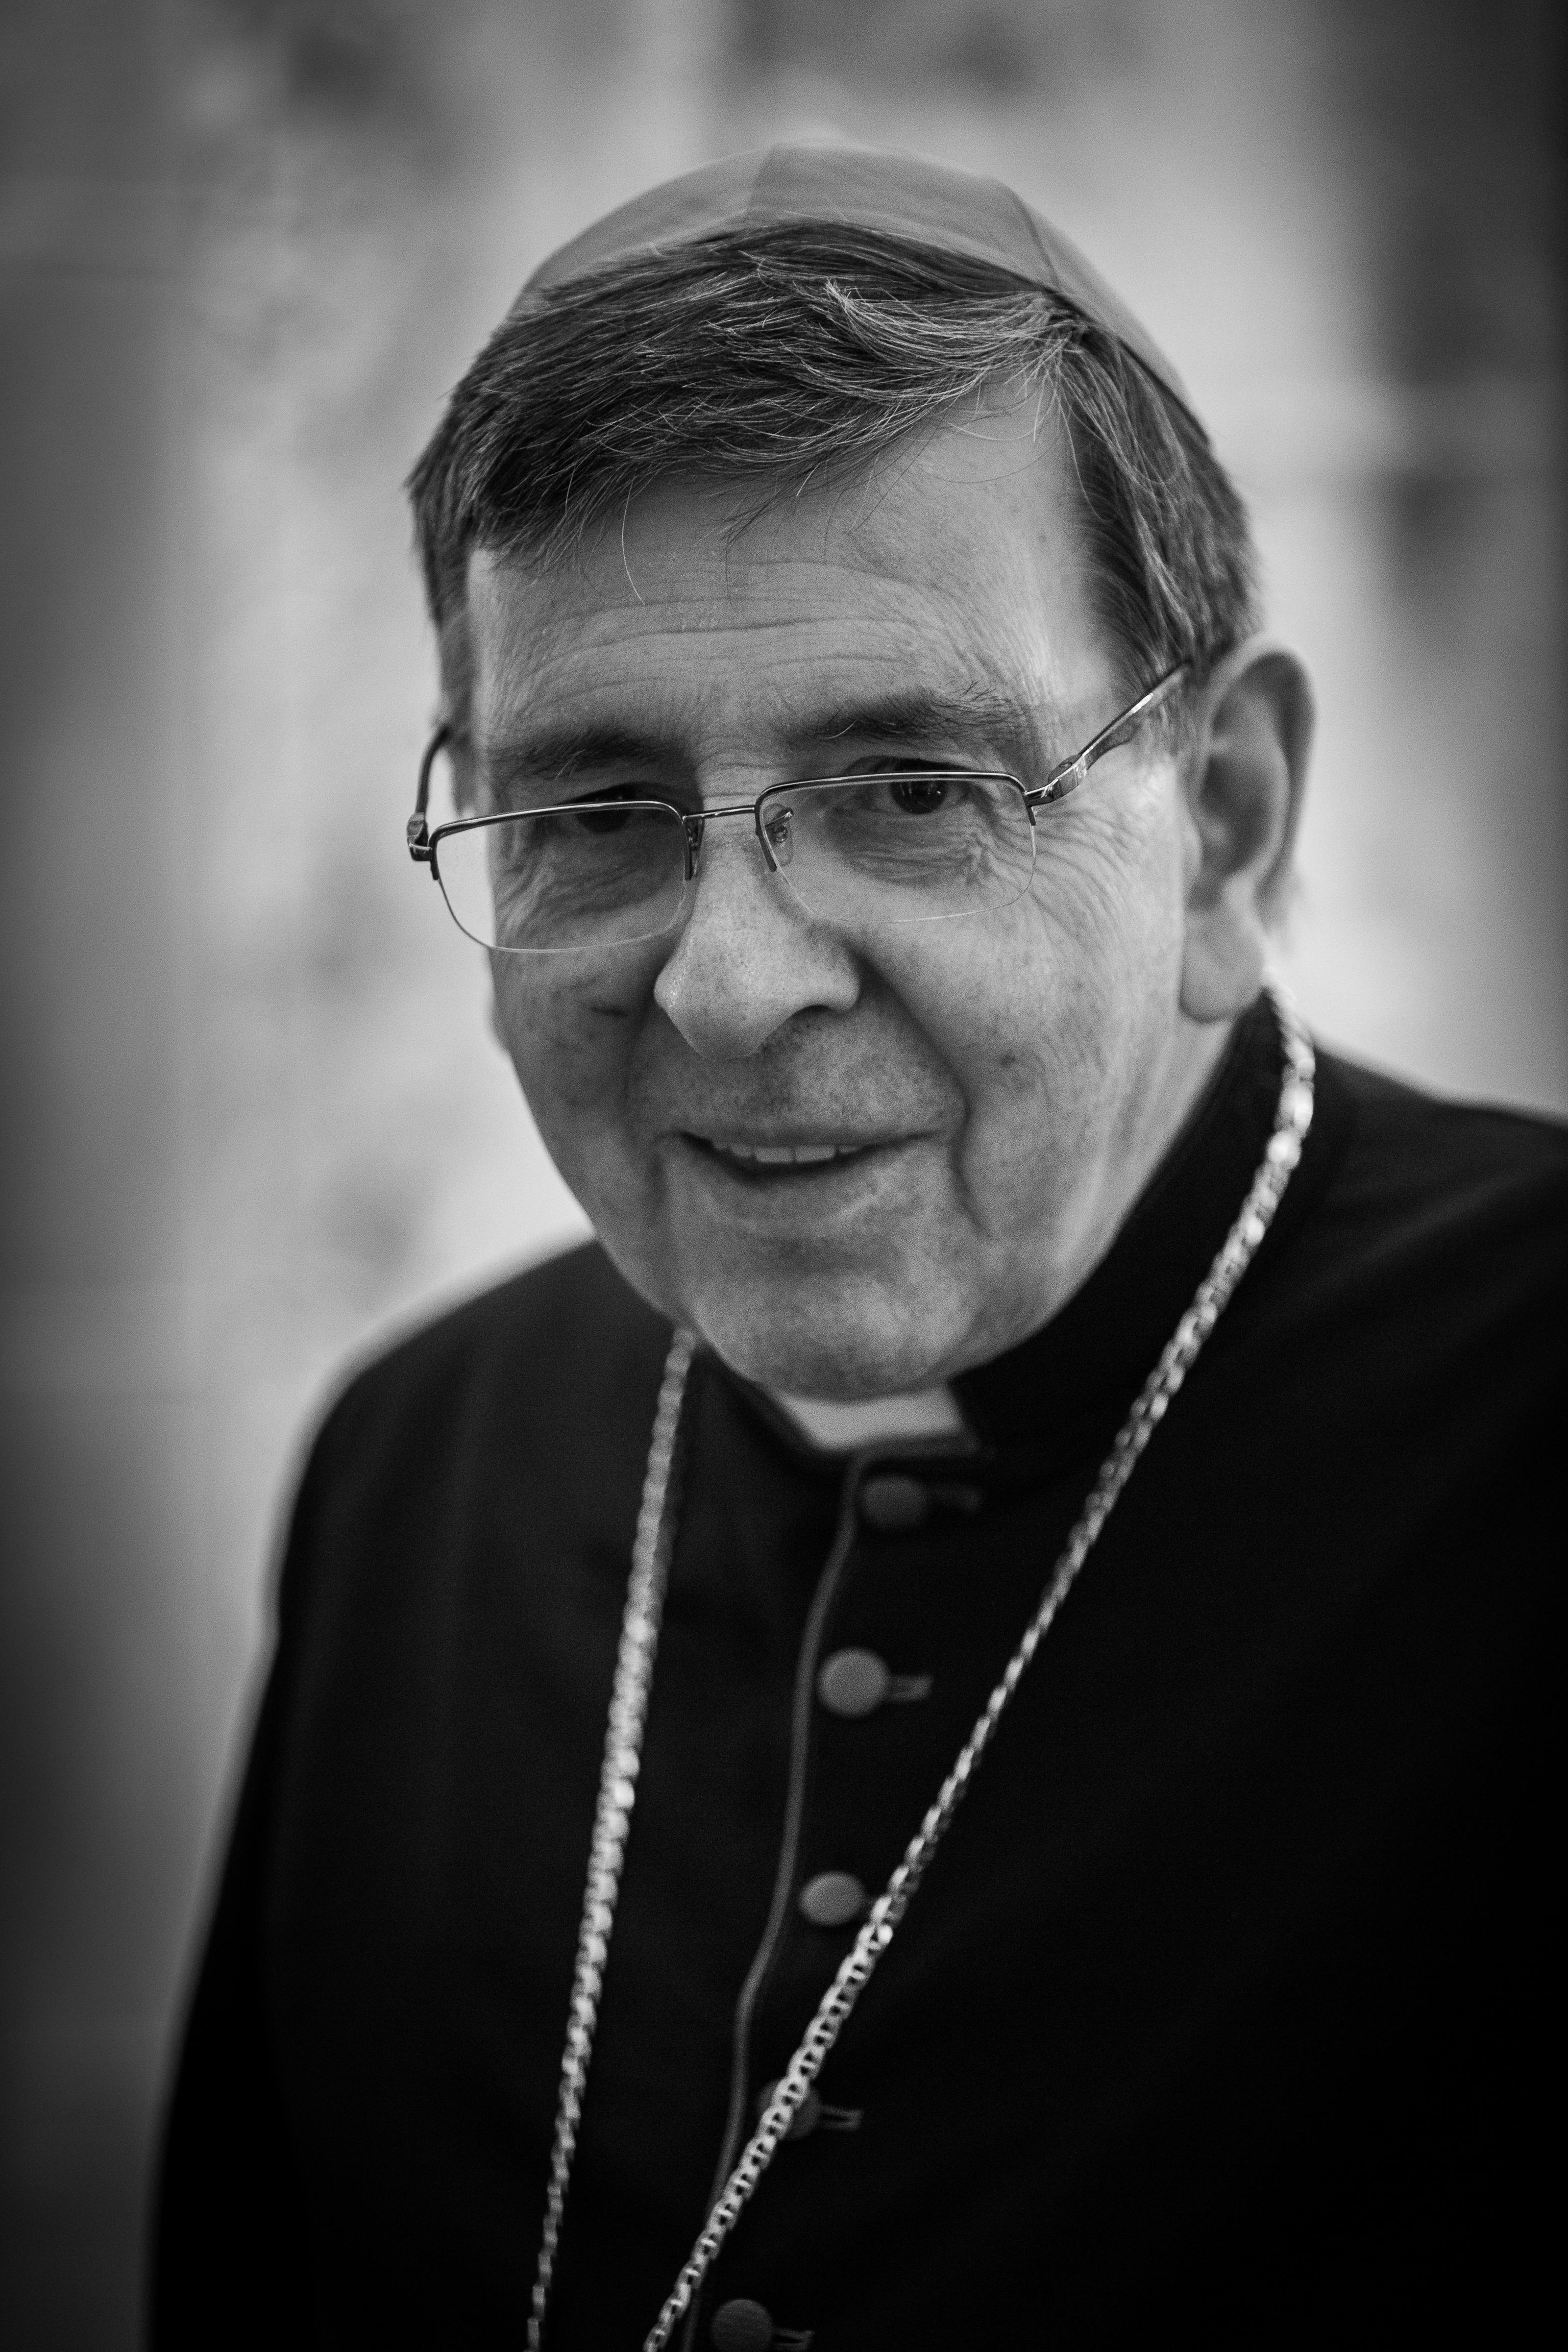 Kurt koch kardinal wikiwand for Koch wikipedia